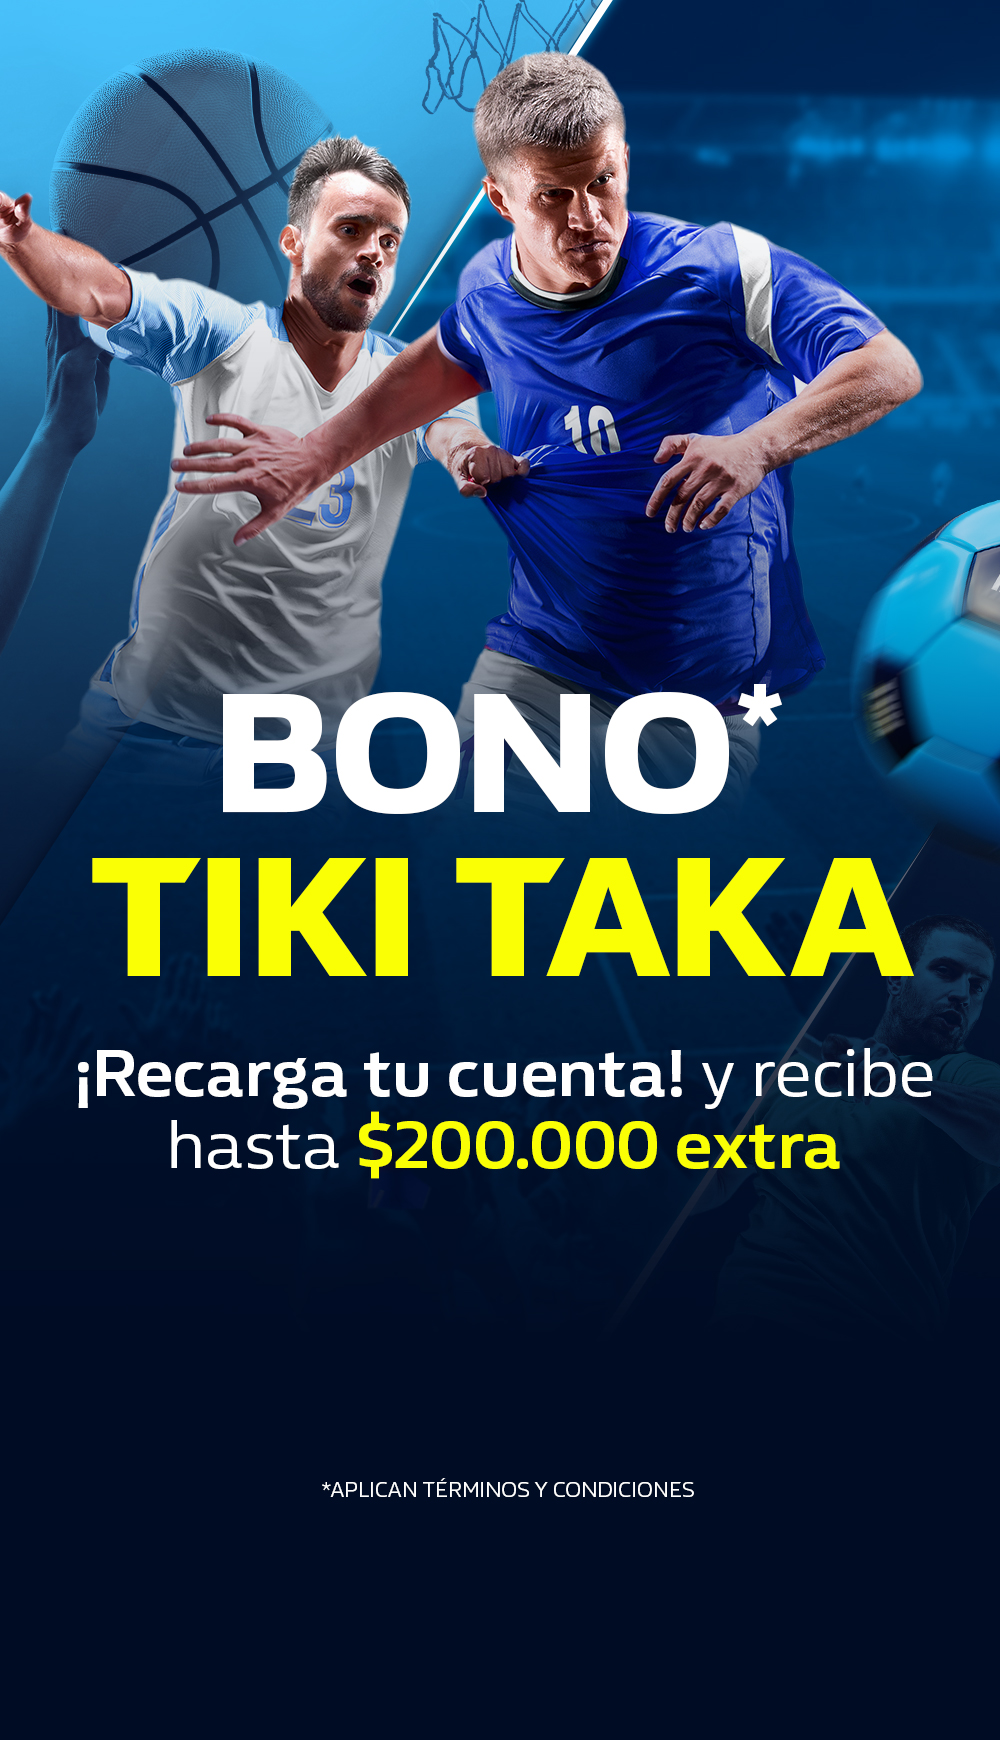 sportbook_bono_tiki_taka_bienvenida_Mobile_full